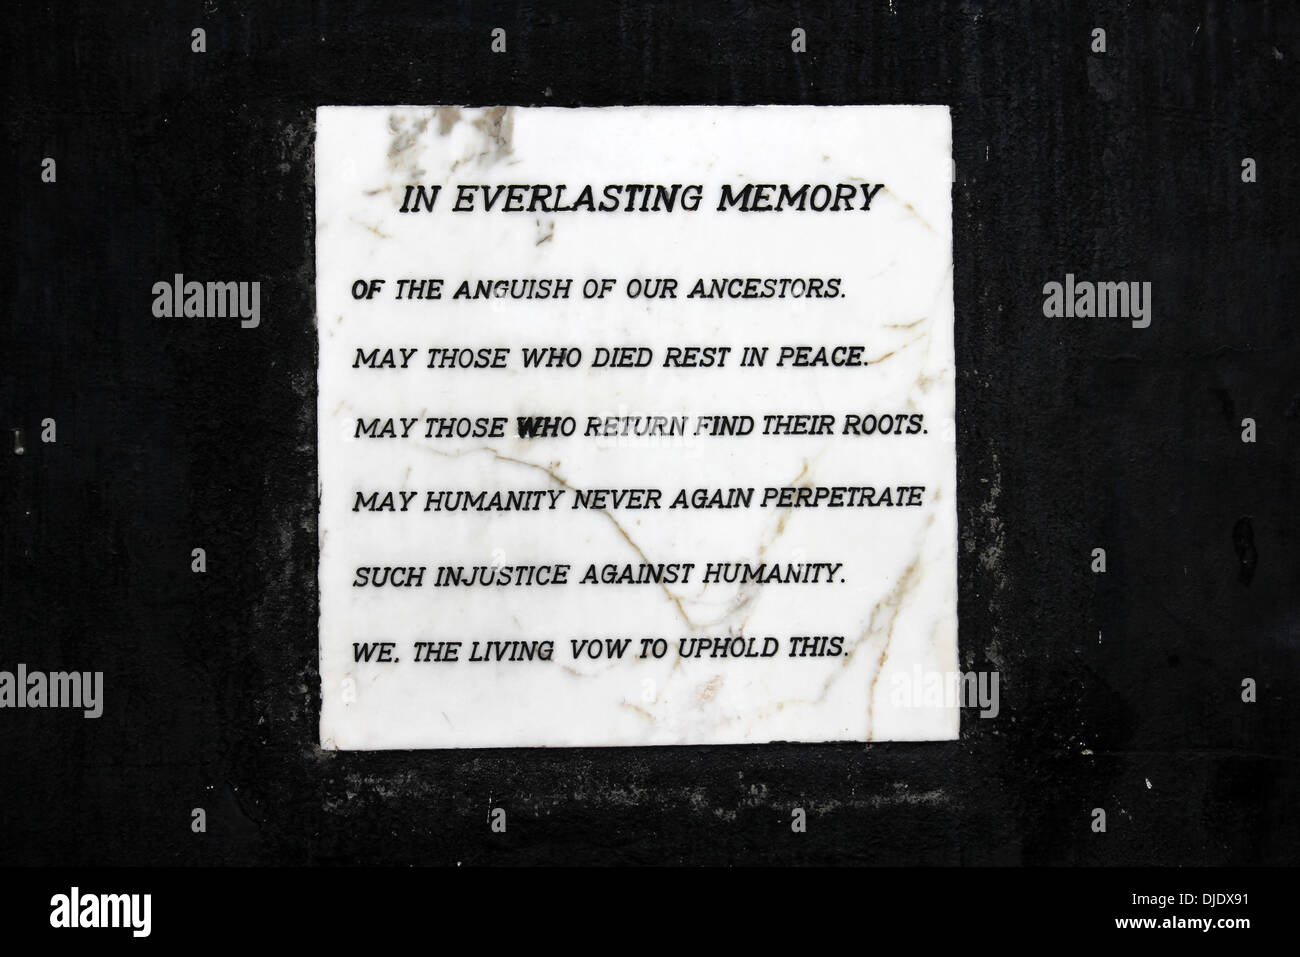 Plaque 'In Everlasting Memory' - Slave Castle, Ghana - Stock Image